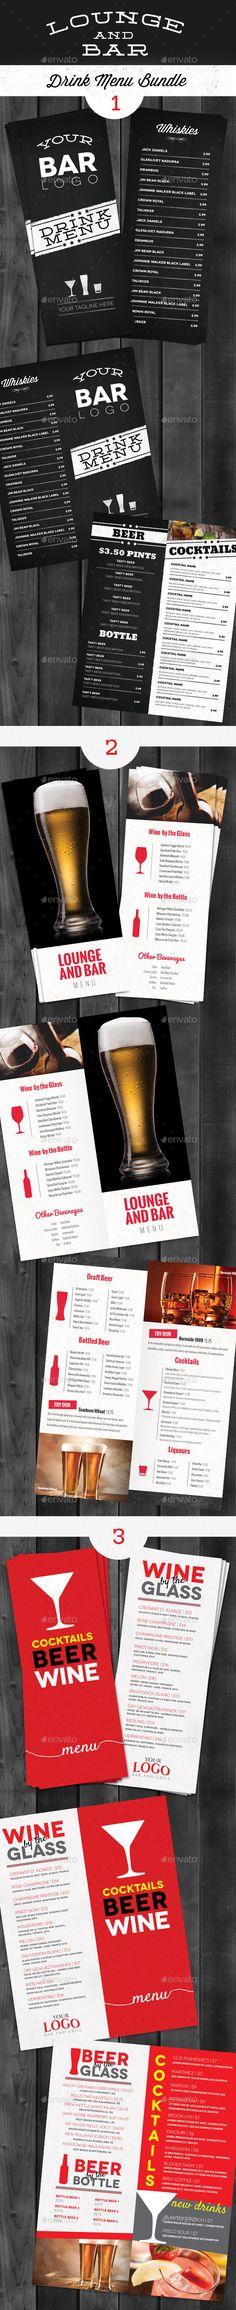 Lounge Bar Drink Menu Bundle  - #Food #Menus Print Templates Download here:  https://graphicriver.net/item/lounge-bar-drink-menu-bundle-/9742587?ref=alena994